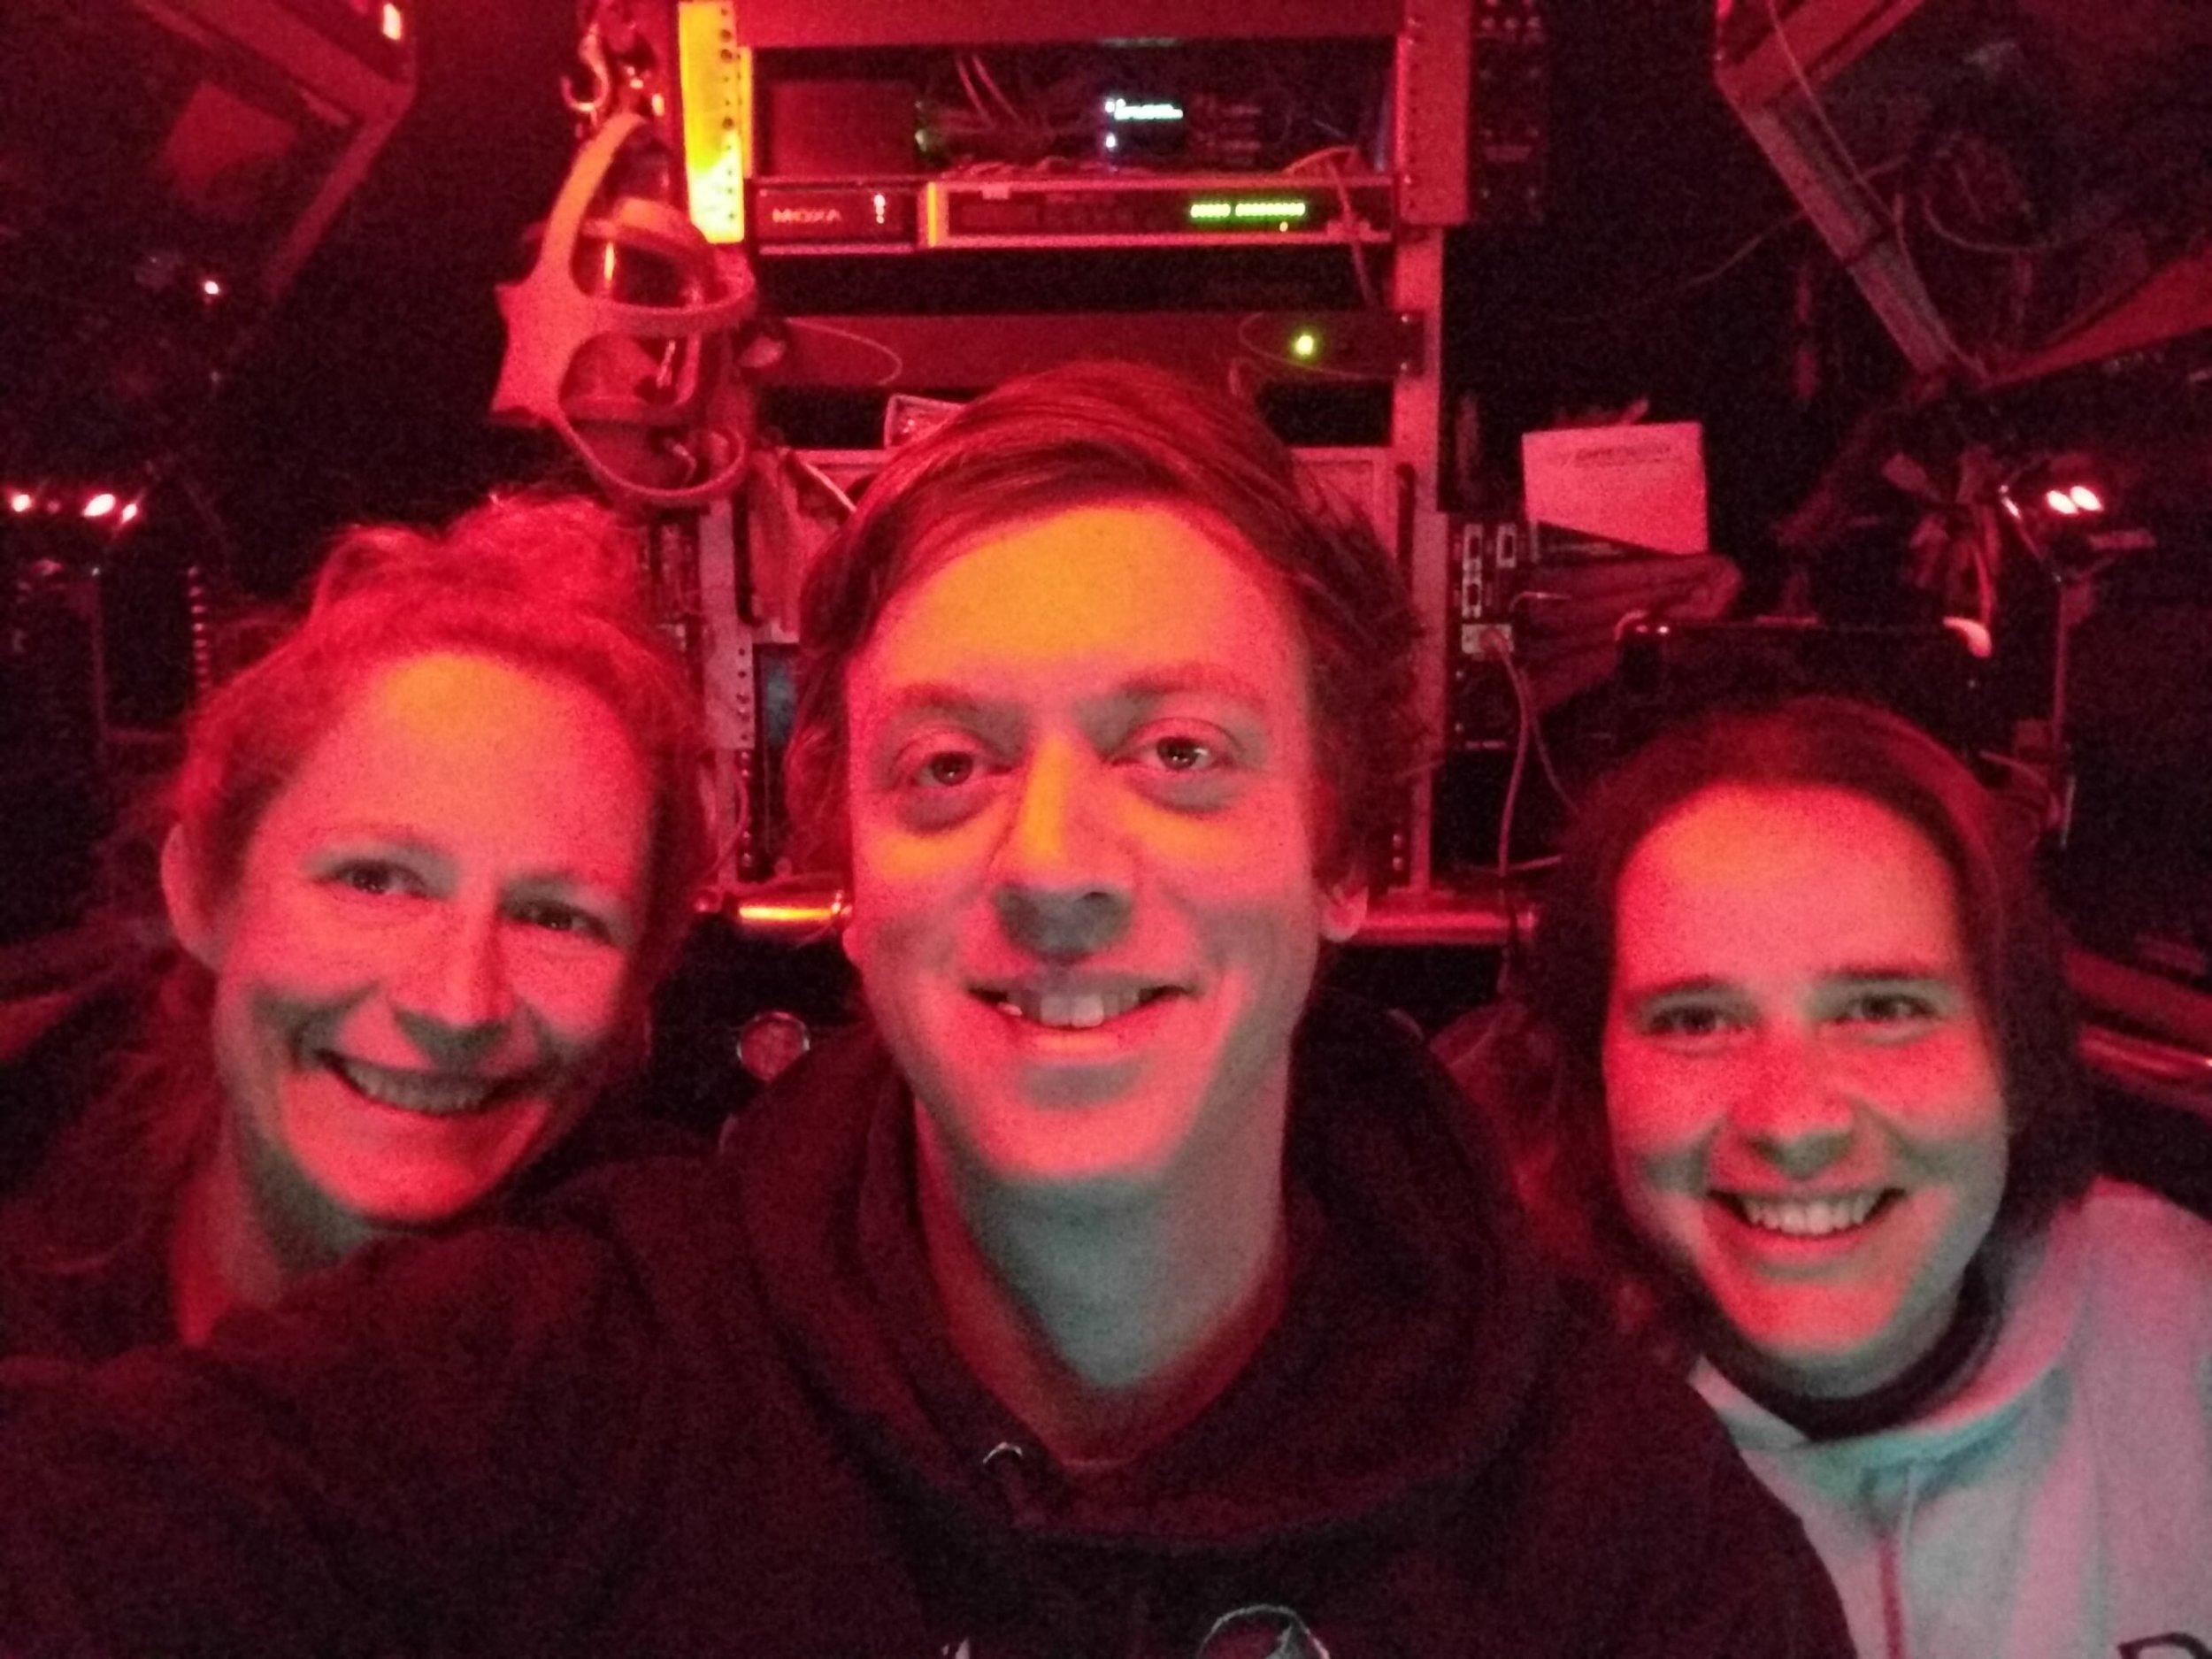 Dr. Alysia Cox, Danik Forsman, and Dr. Elizabeth Trembath-Reichert   Photo Credit: Danik Forsman